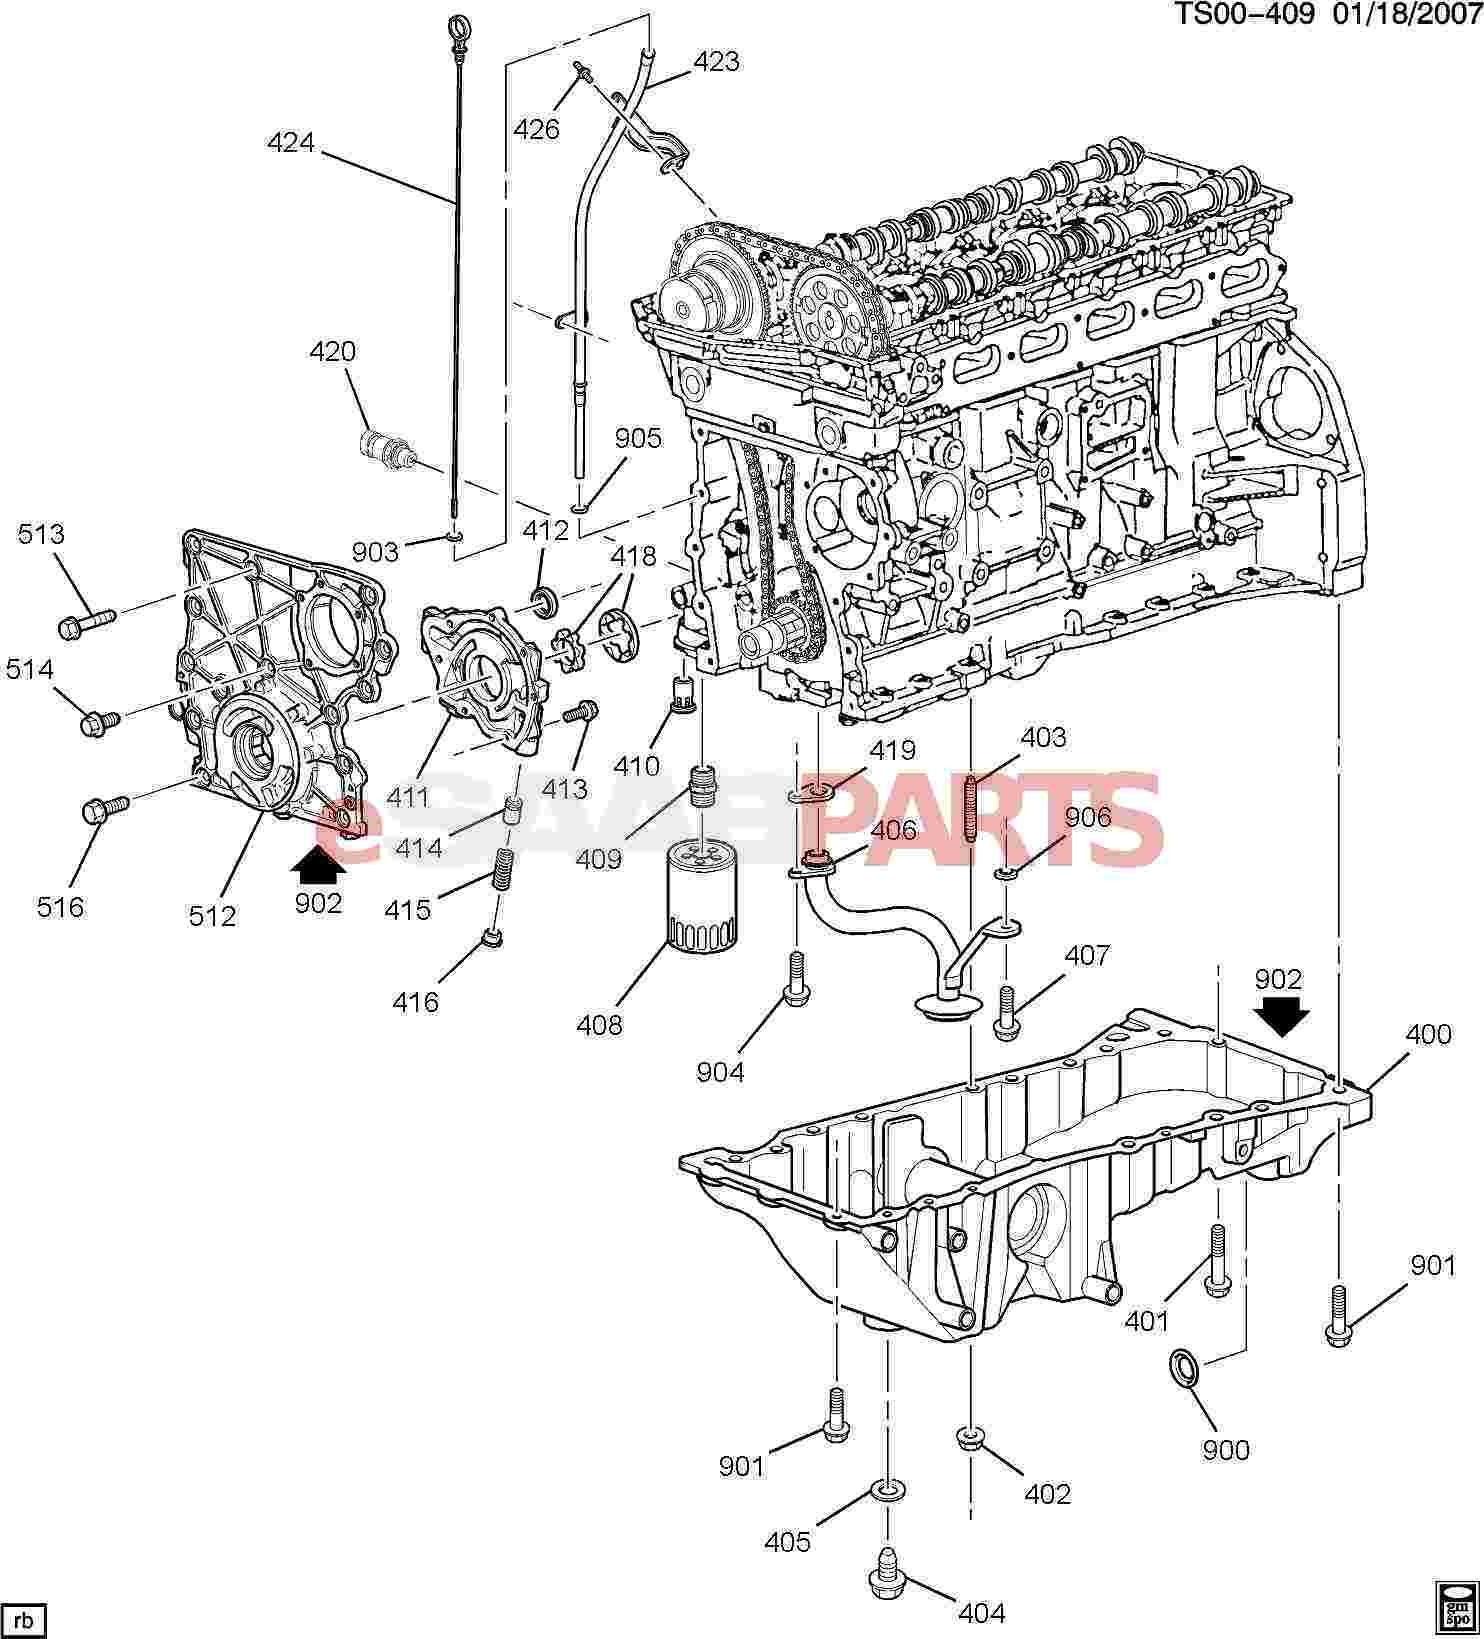 lube oil system diagram anderson plug wiring for caravan engine lubrication my